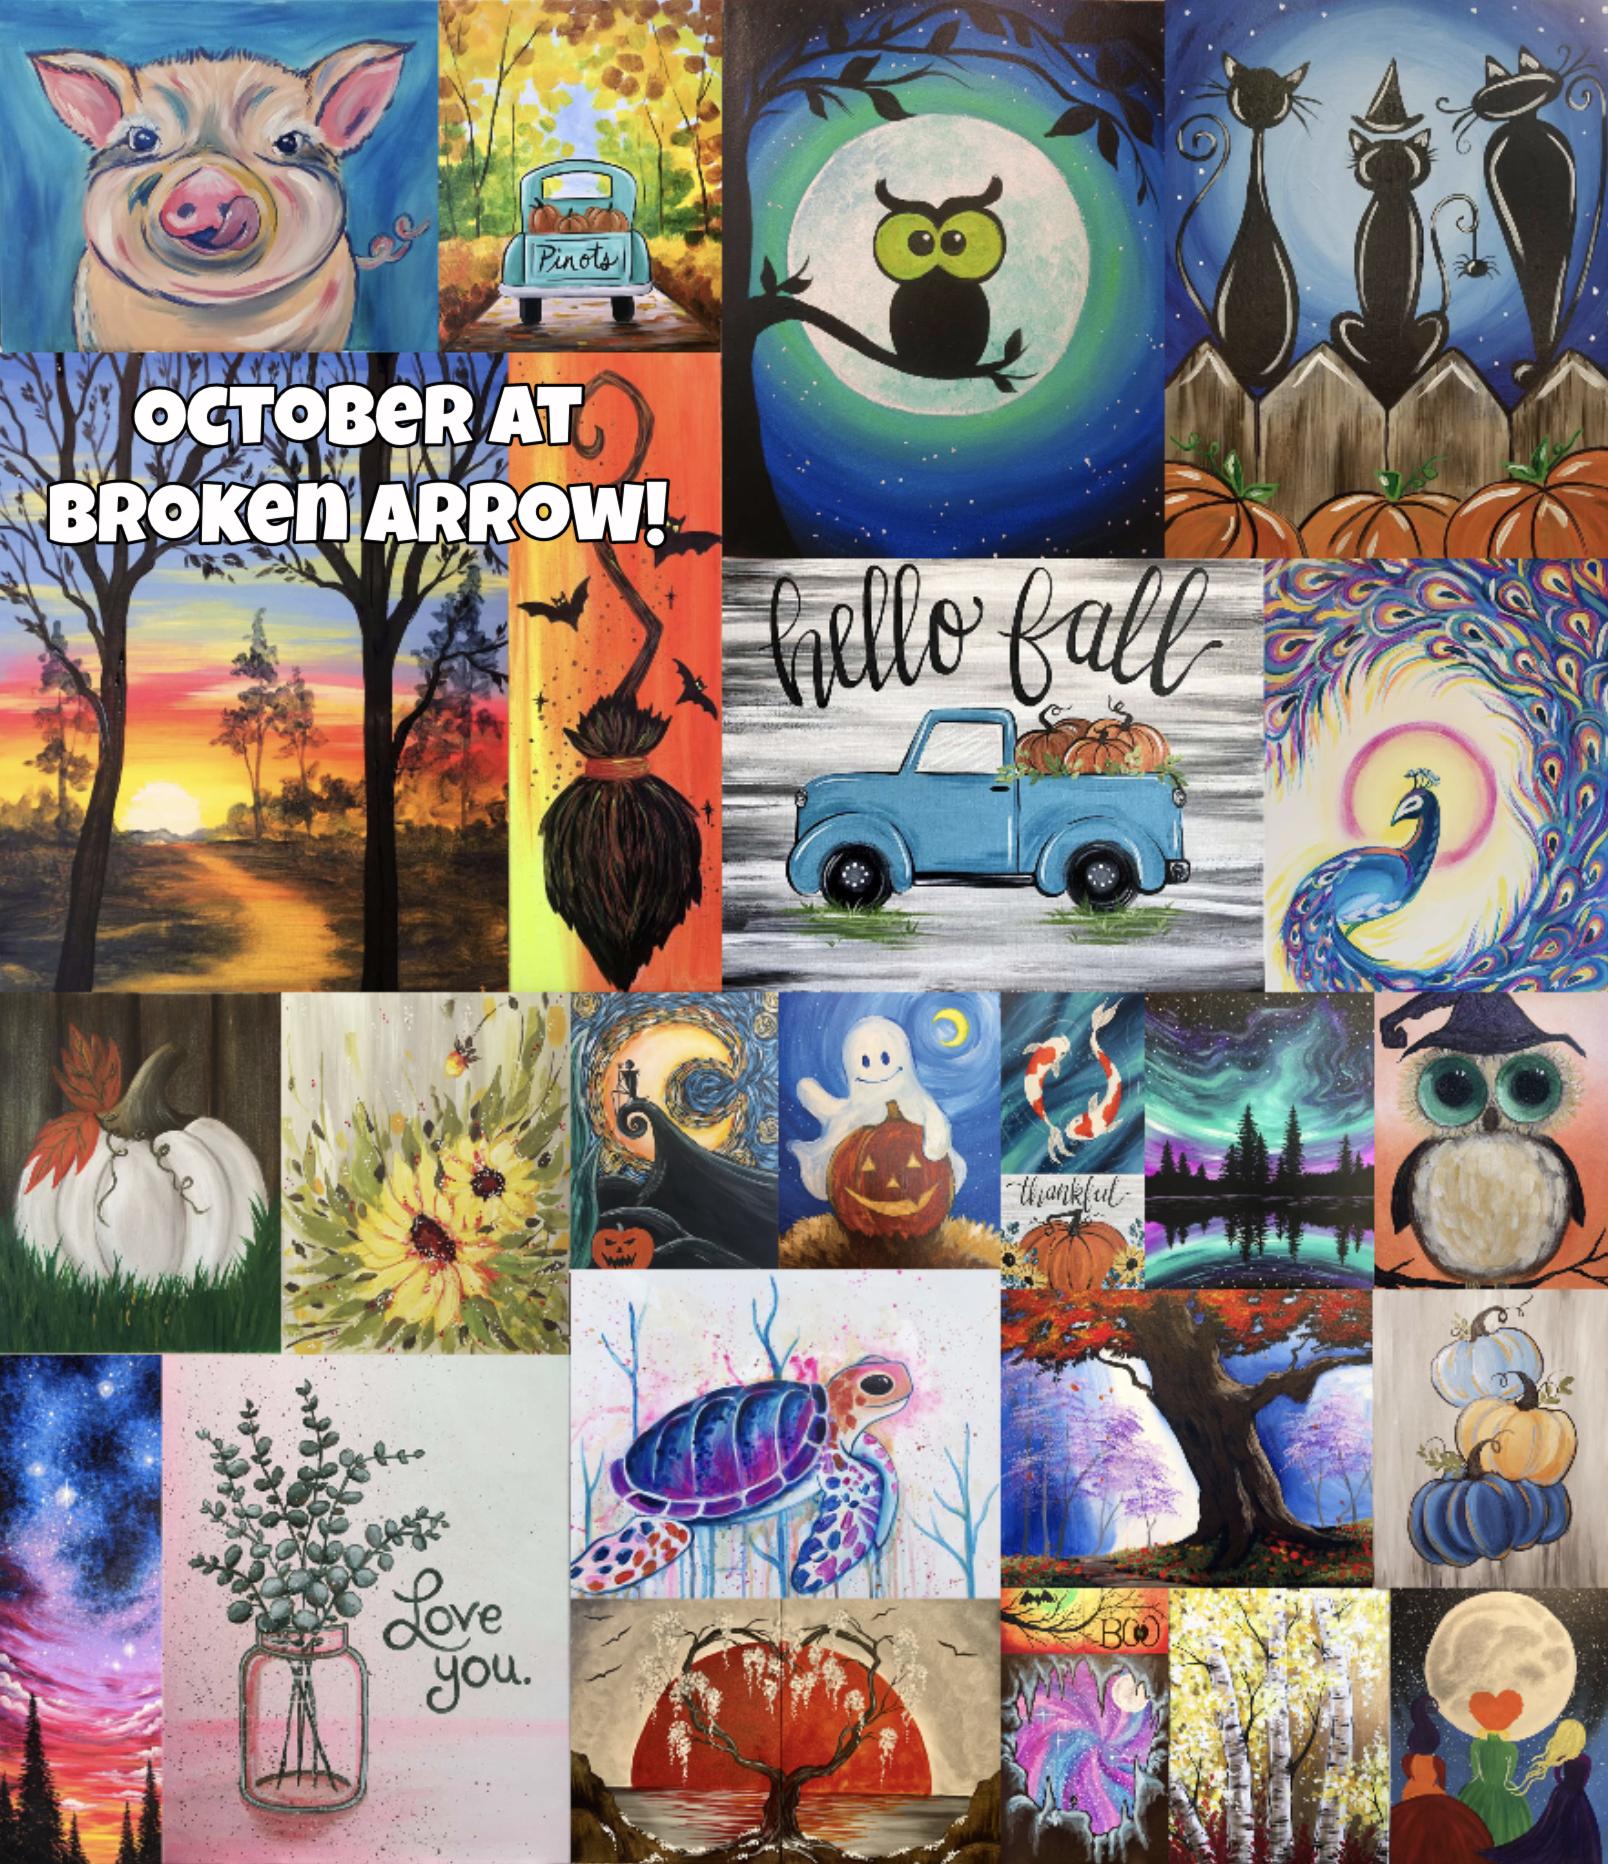 Broken Arrow October Calendar!